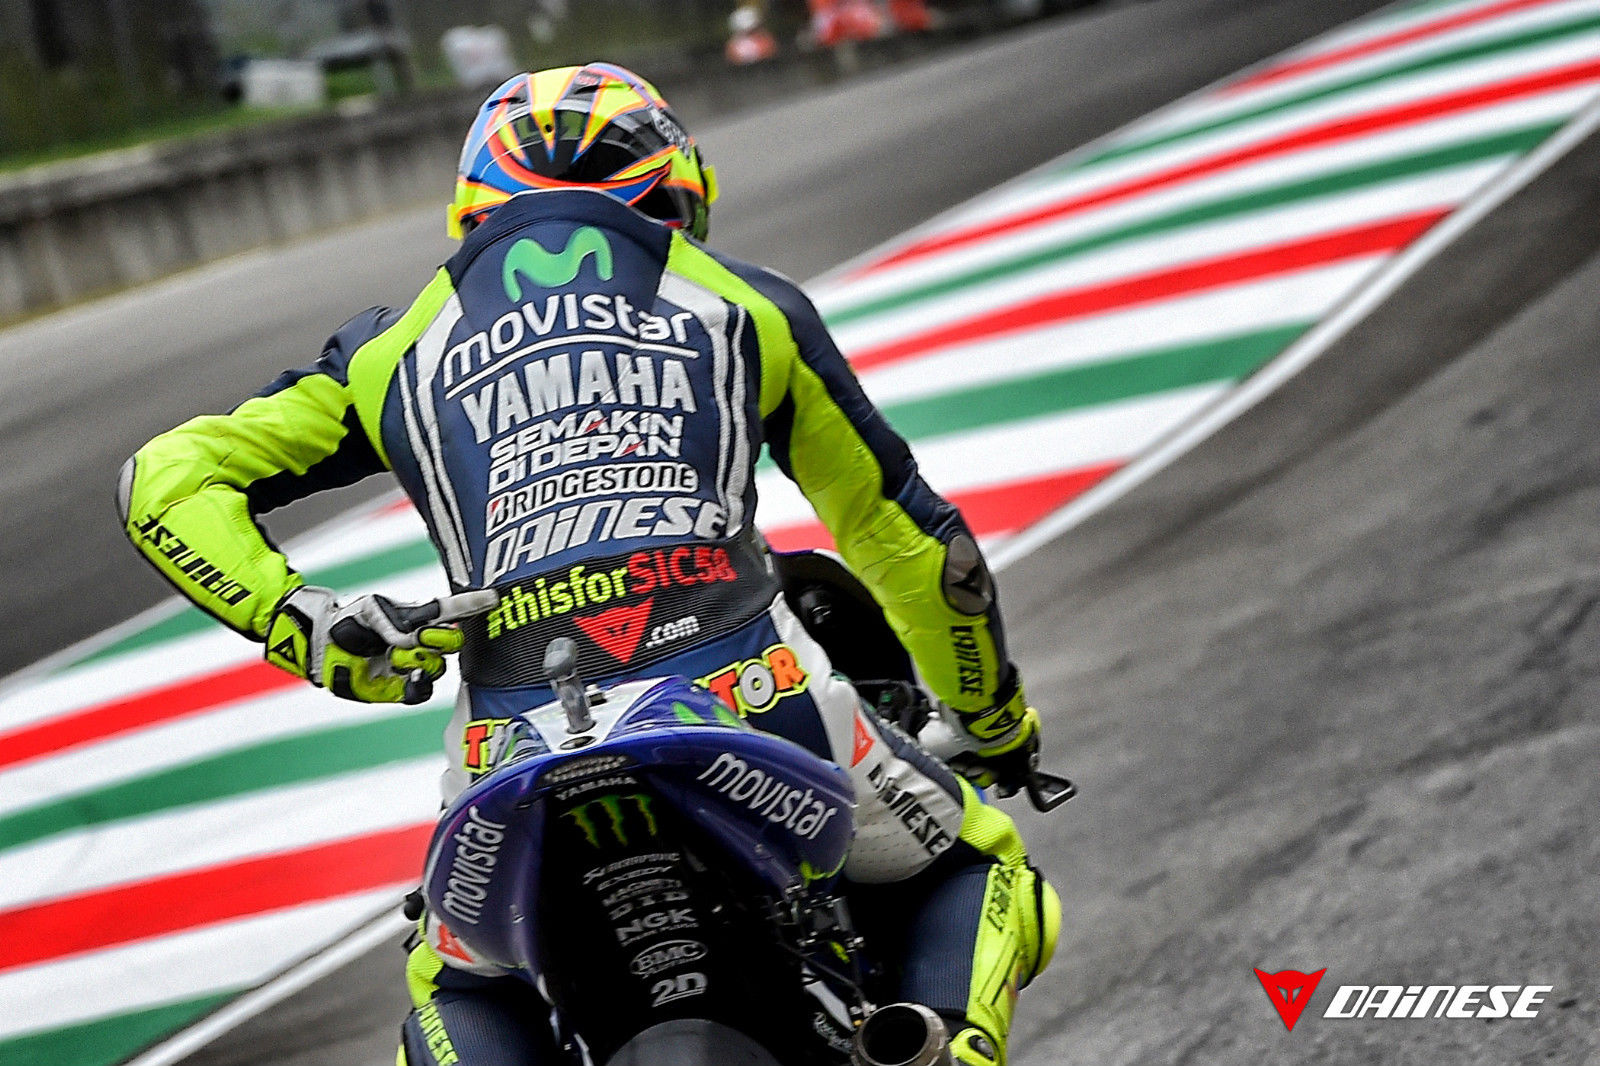 Valentino Rossi #thisforSIC58 Mugello Leathers Up for Sale - autoevolution